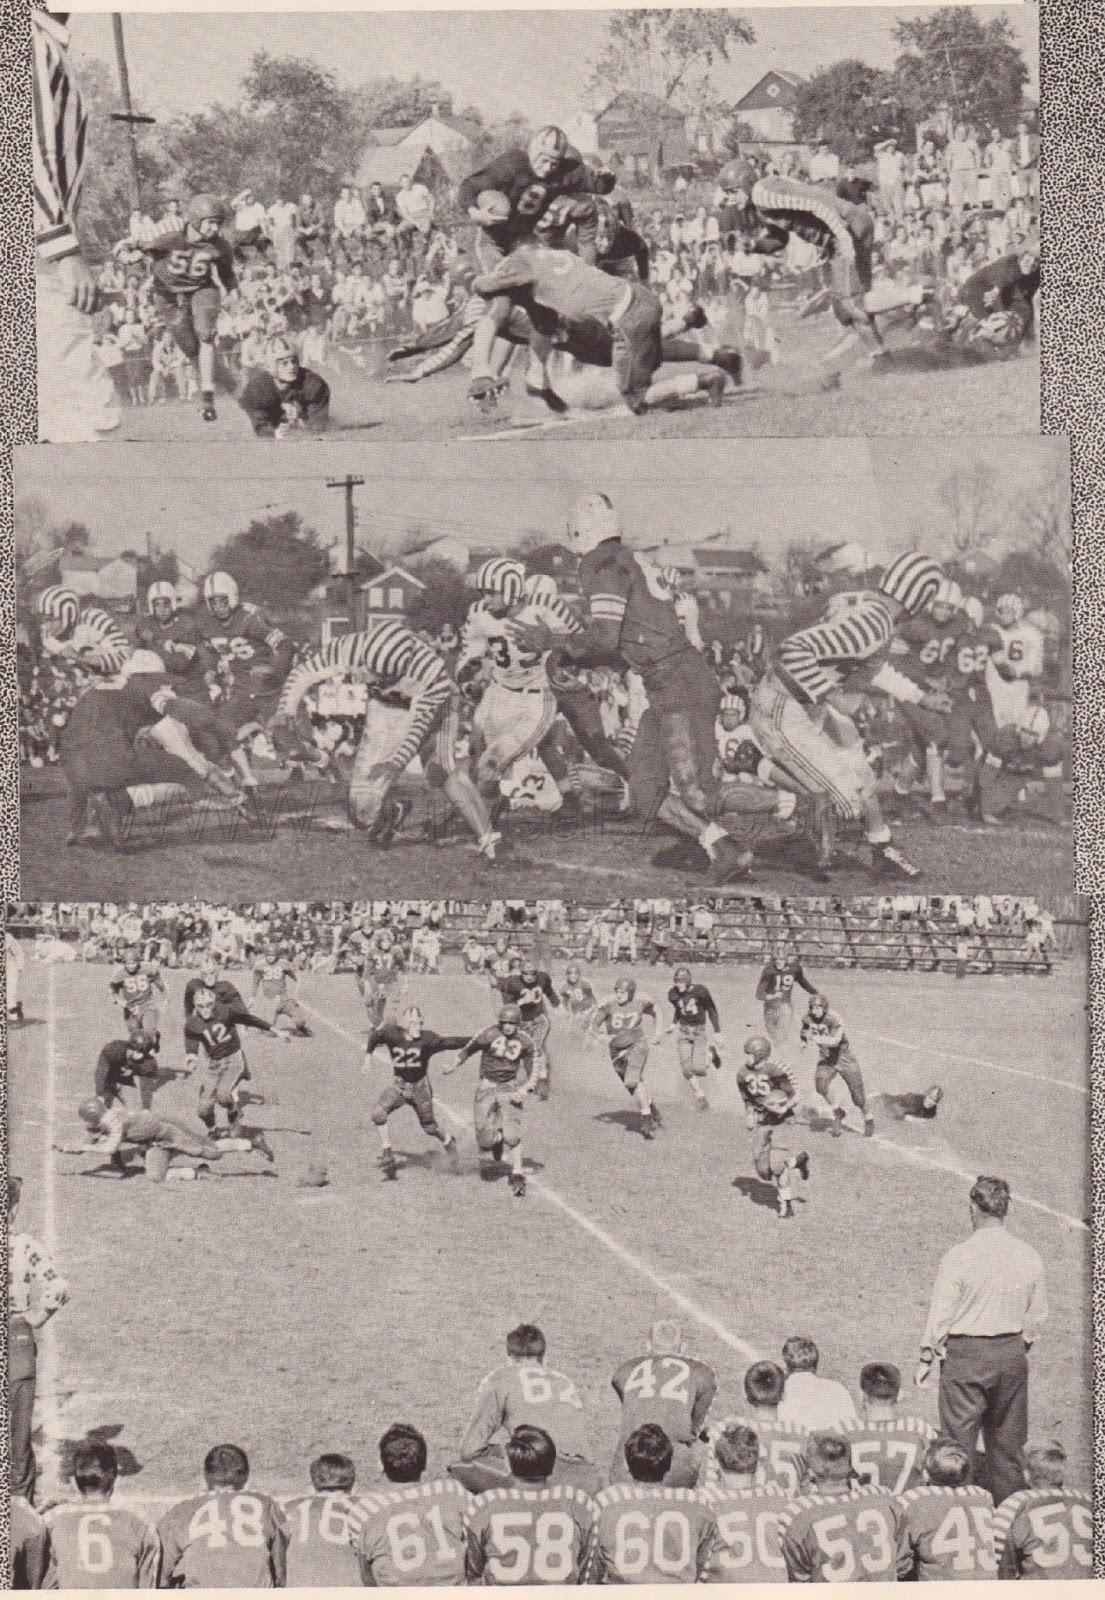 http://pabook.libraries.psu.edu/palitmap/Football.html